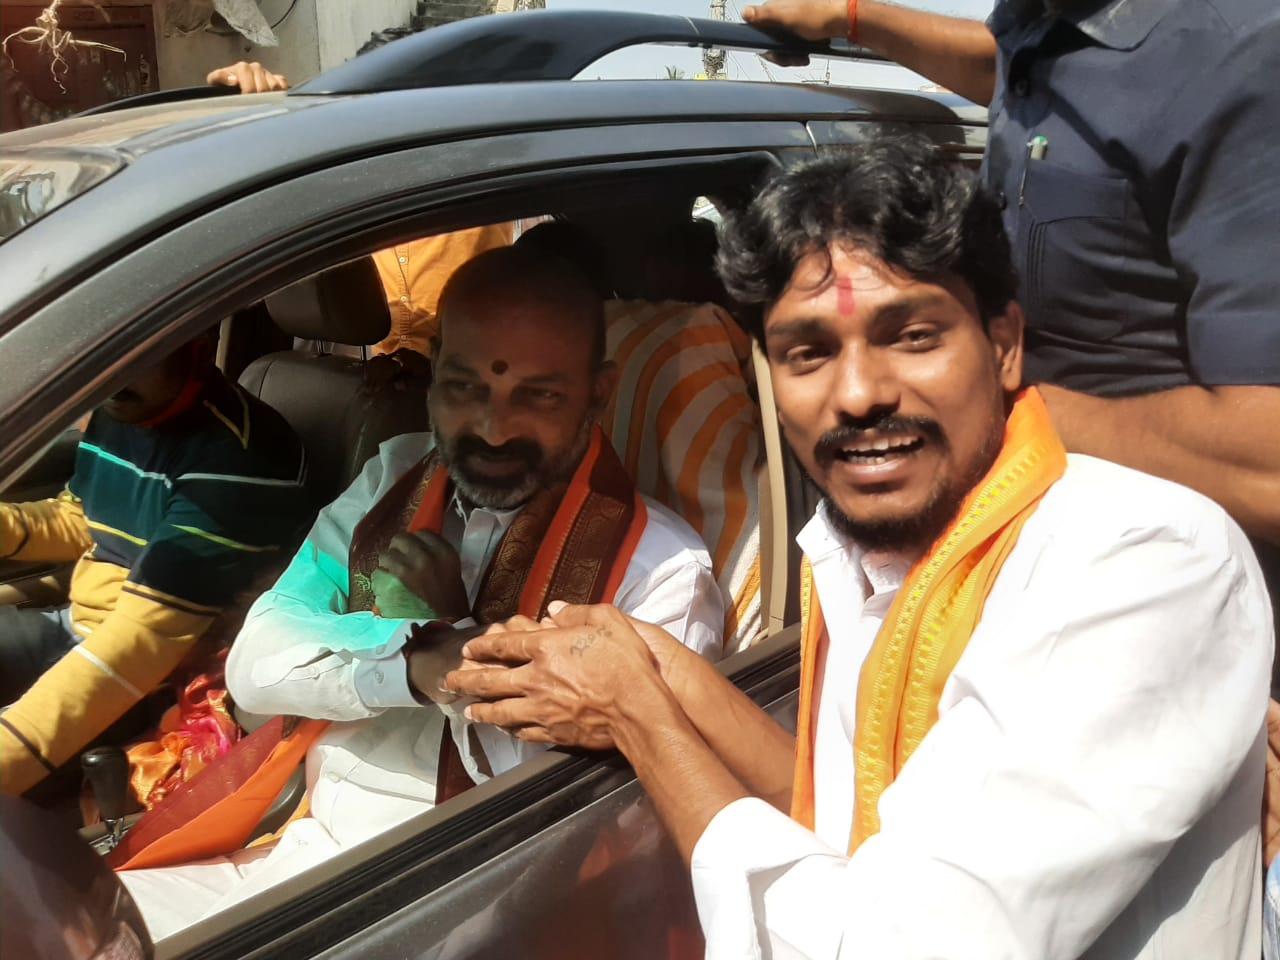 Nadimpally Sravan Kumar | Nakrekal Assembly Incharge | RSS | ABVP | BJYM | Incharge of Shakthi Kendra | Booth Committee Member | Narketpally Town President | Mandal President | Party Activist | Social Activist | Narketpally | Nakrekal | Nalgonda | Telangana | theLeadersPage